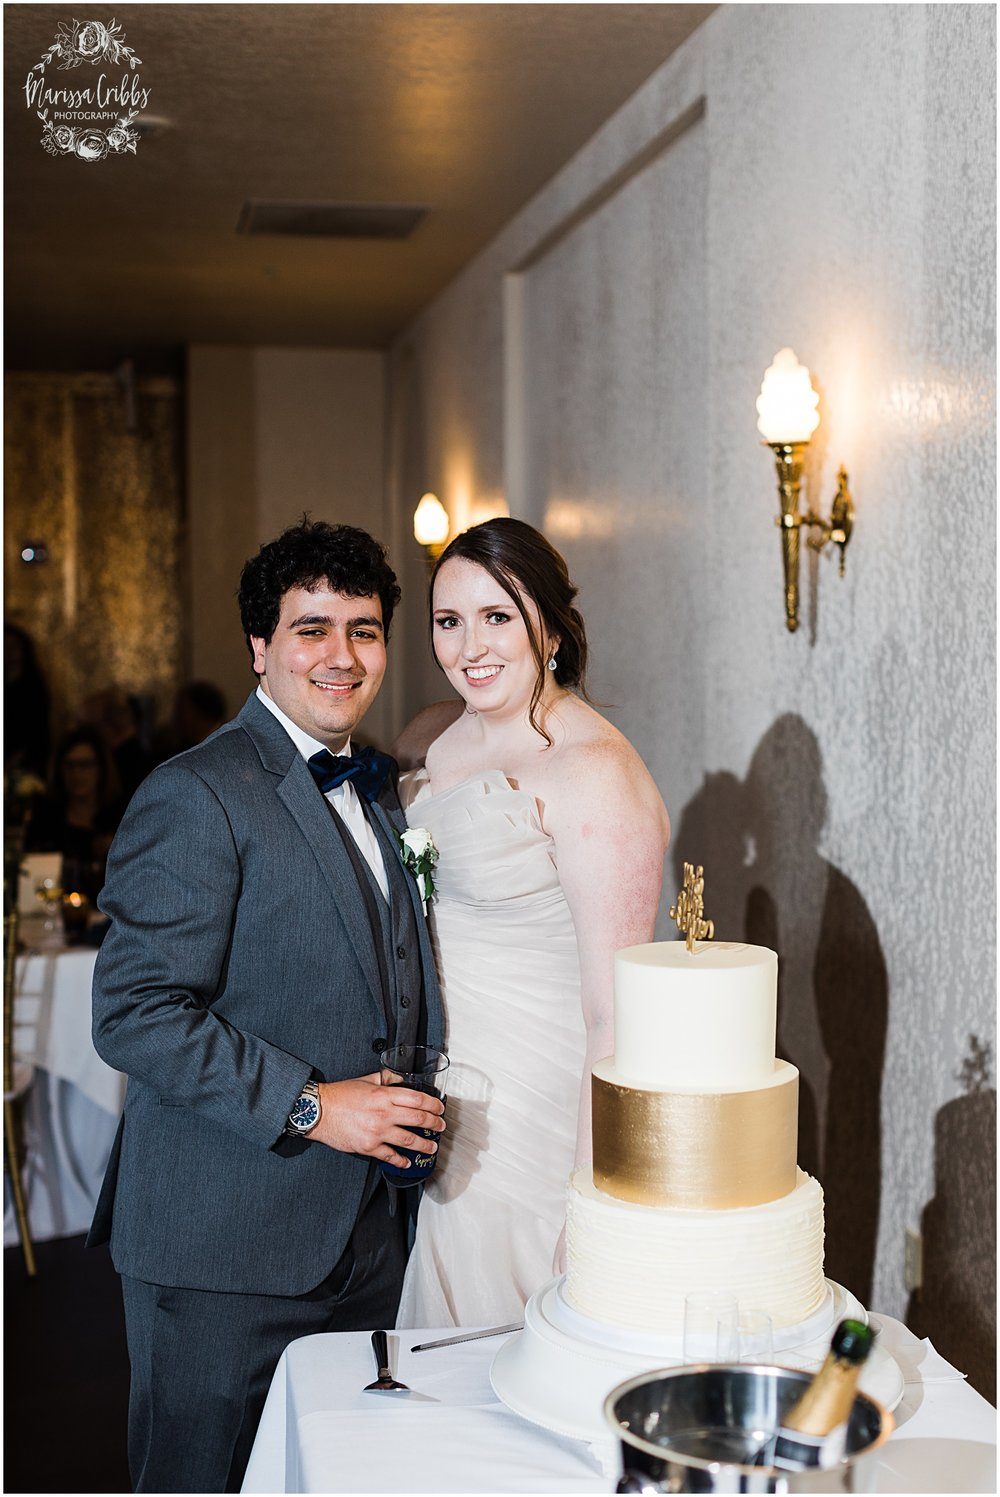 JULIA & AUSTIN MADRID THEATRE WEDDING | MARISSA CRIBBS PHOTOGRAPHY_7133.jpg